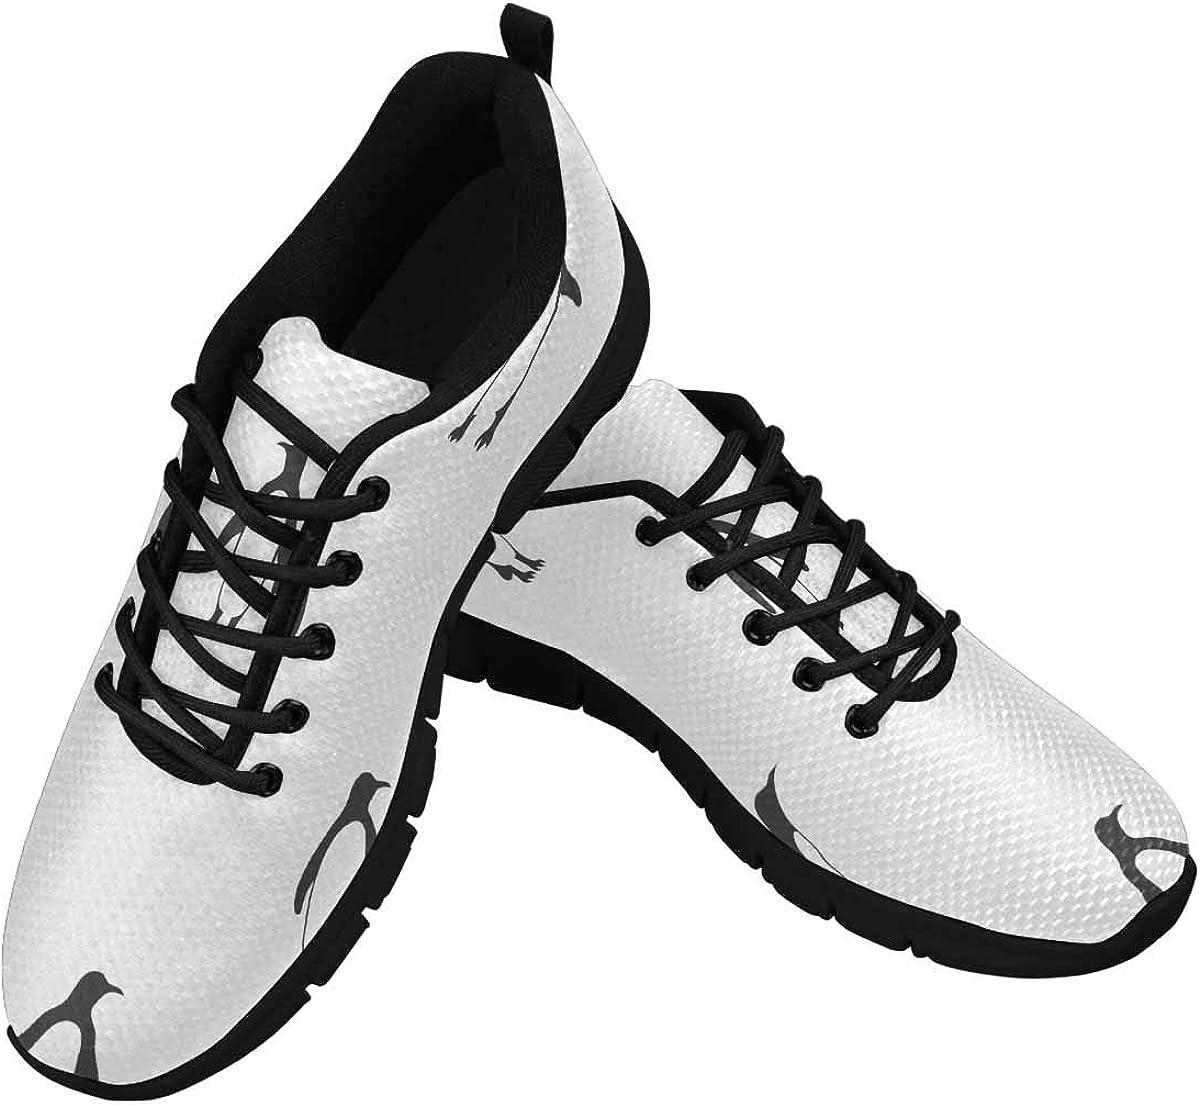 INTERESTPRINT Penguins Pattern Women's Lace Up Running Comfort Sports Sneakers